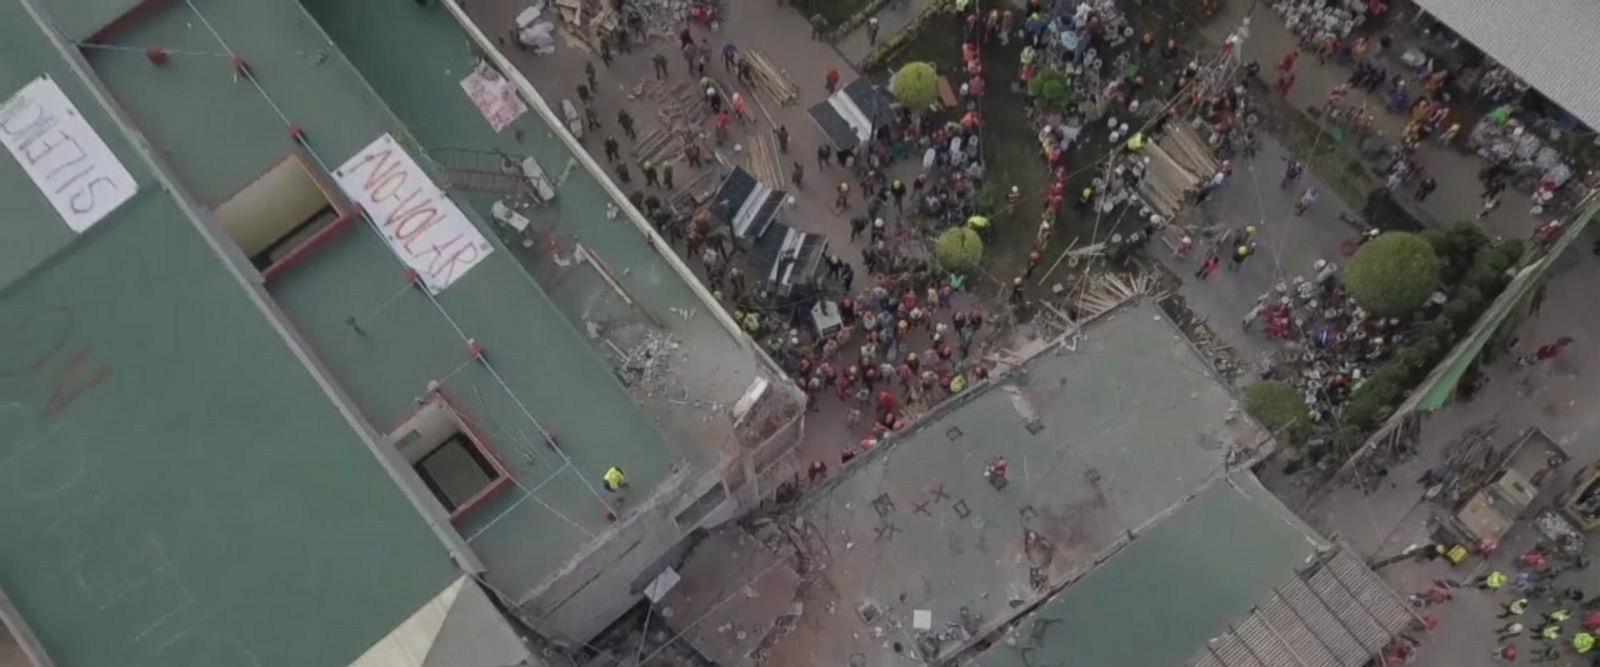 VIDEO: More than 200 dead after magnitude 7.1 quake strikes Mexico